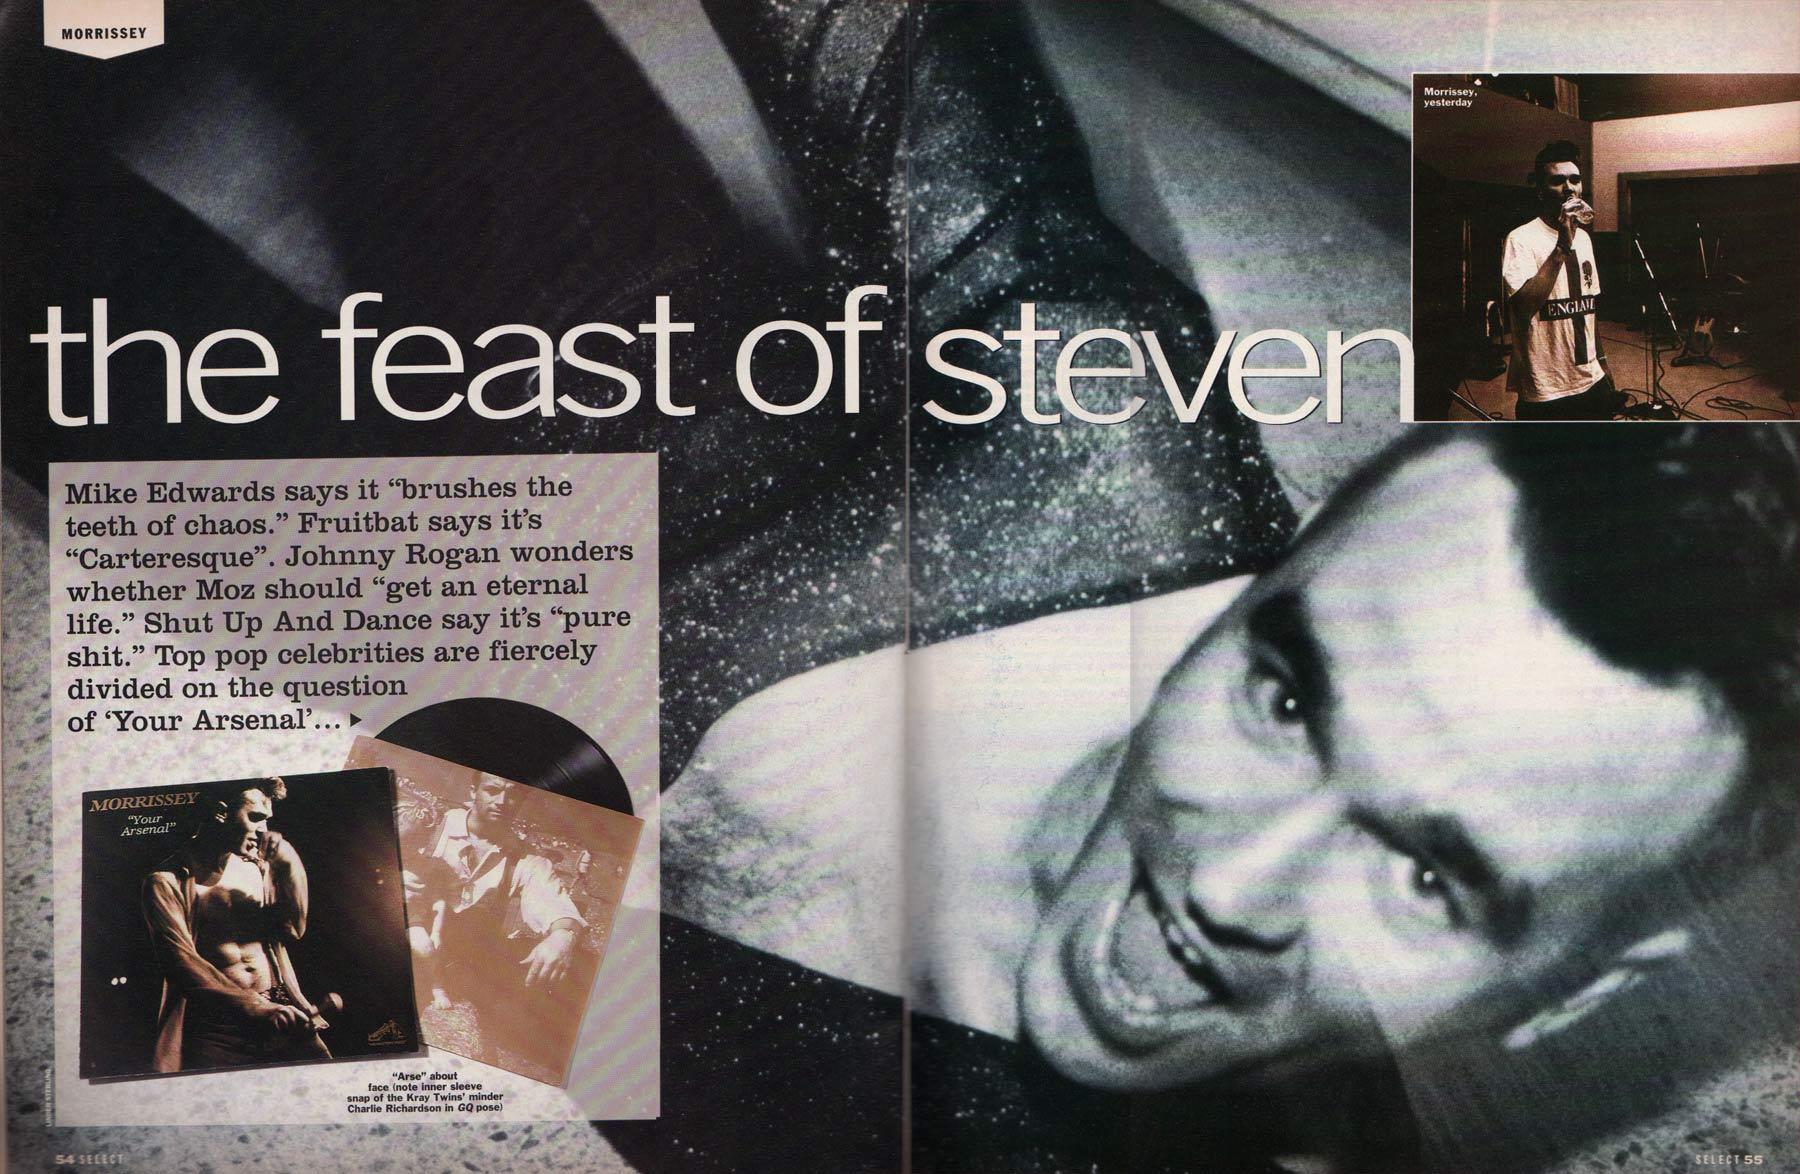 Morrissey Select 1992 i.jpg